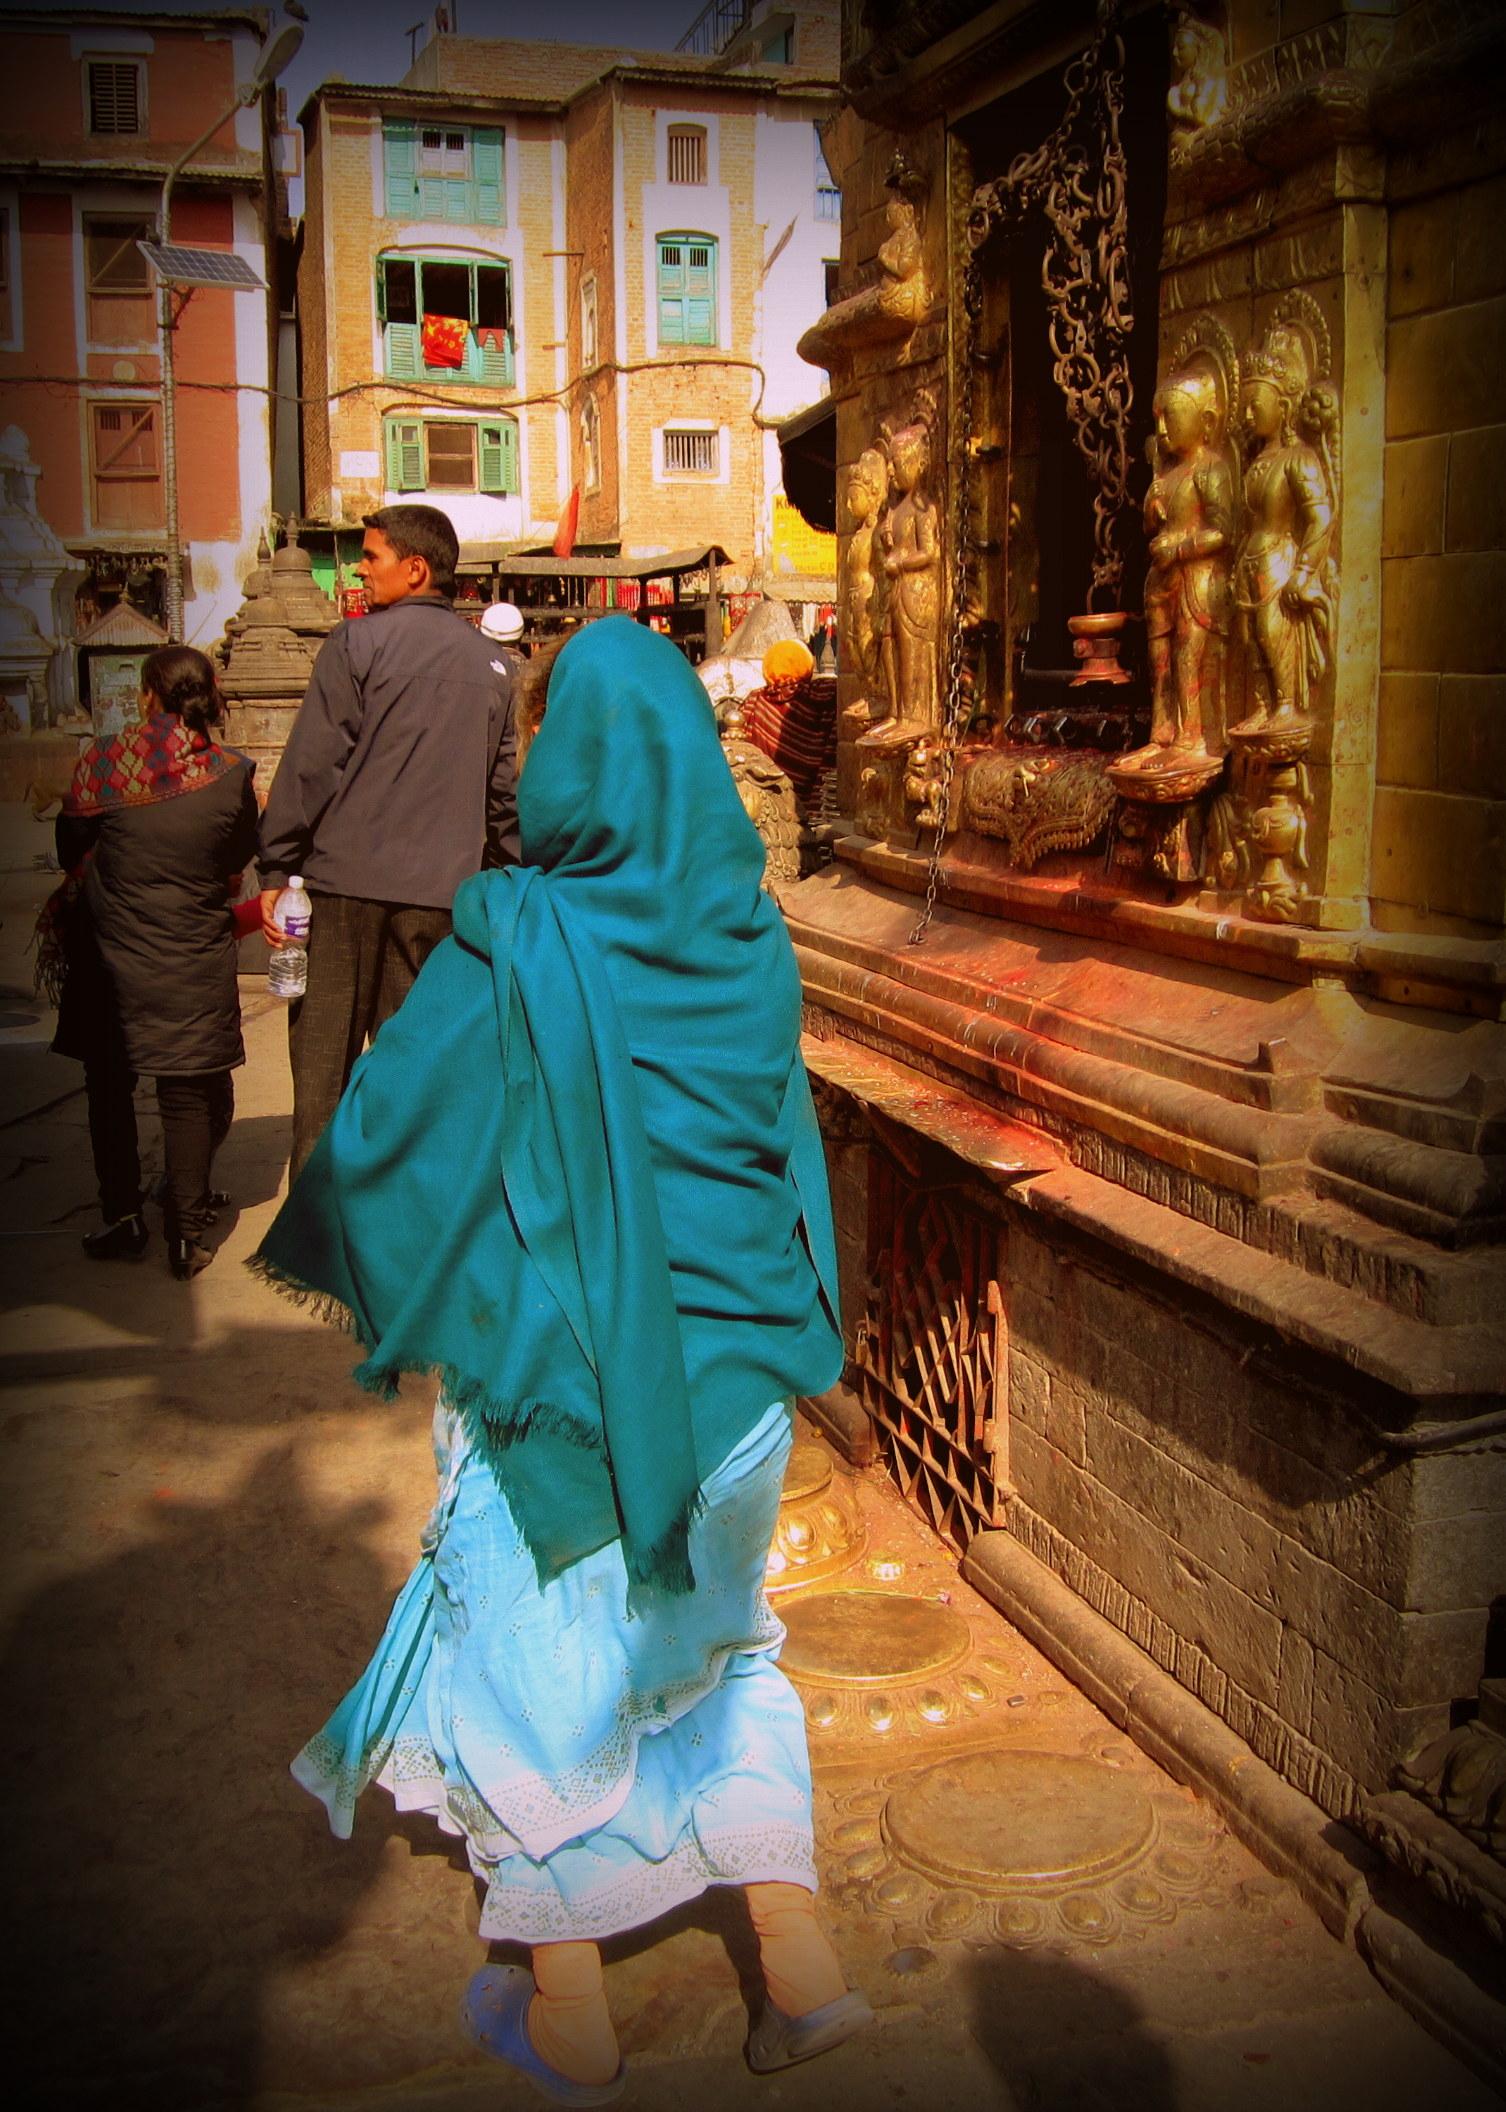 In the streets of Kathmandu, Nepal, a local in her beautiful sari